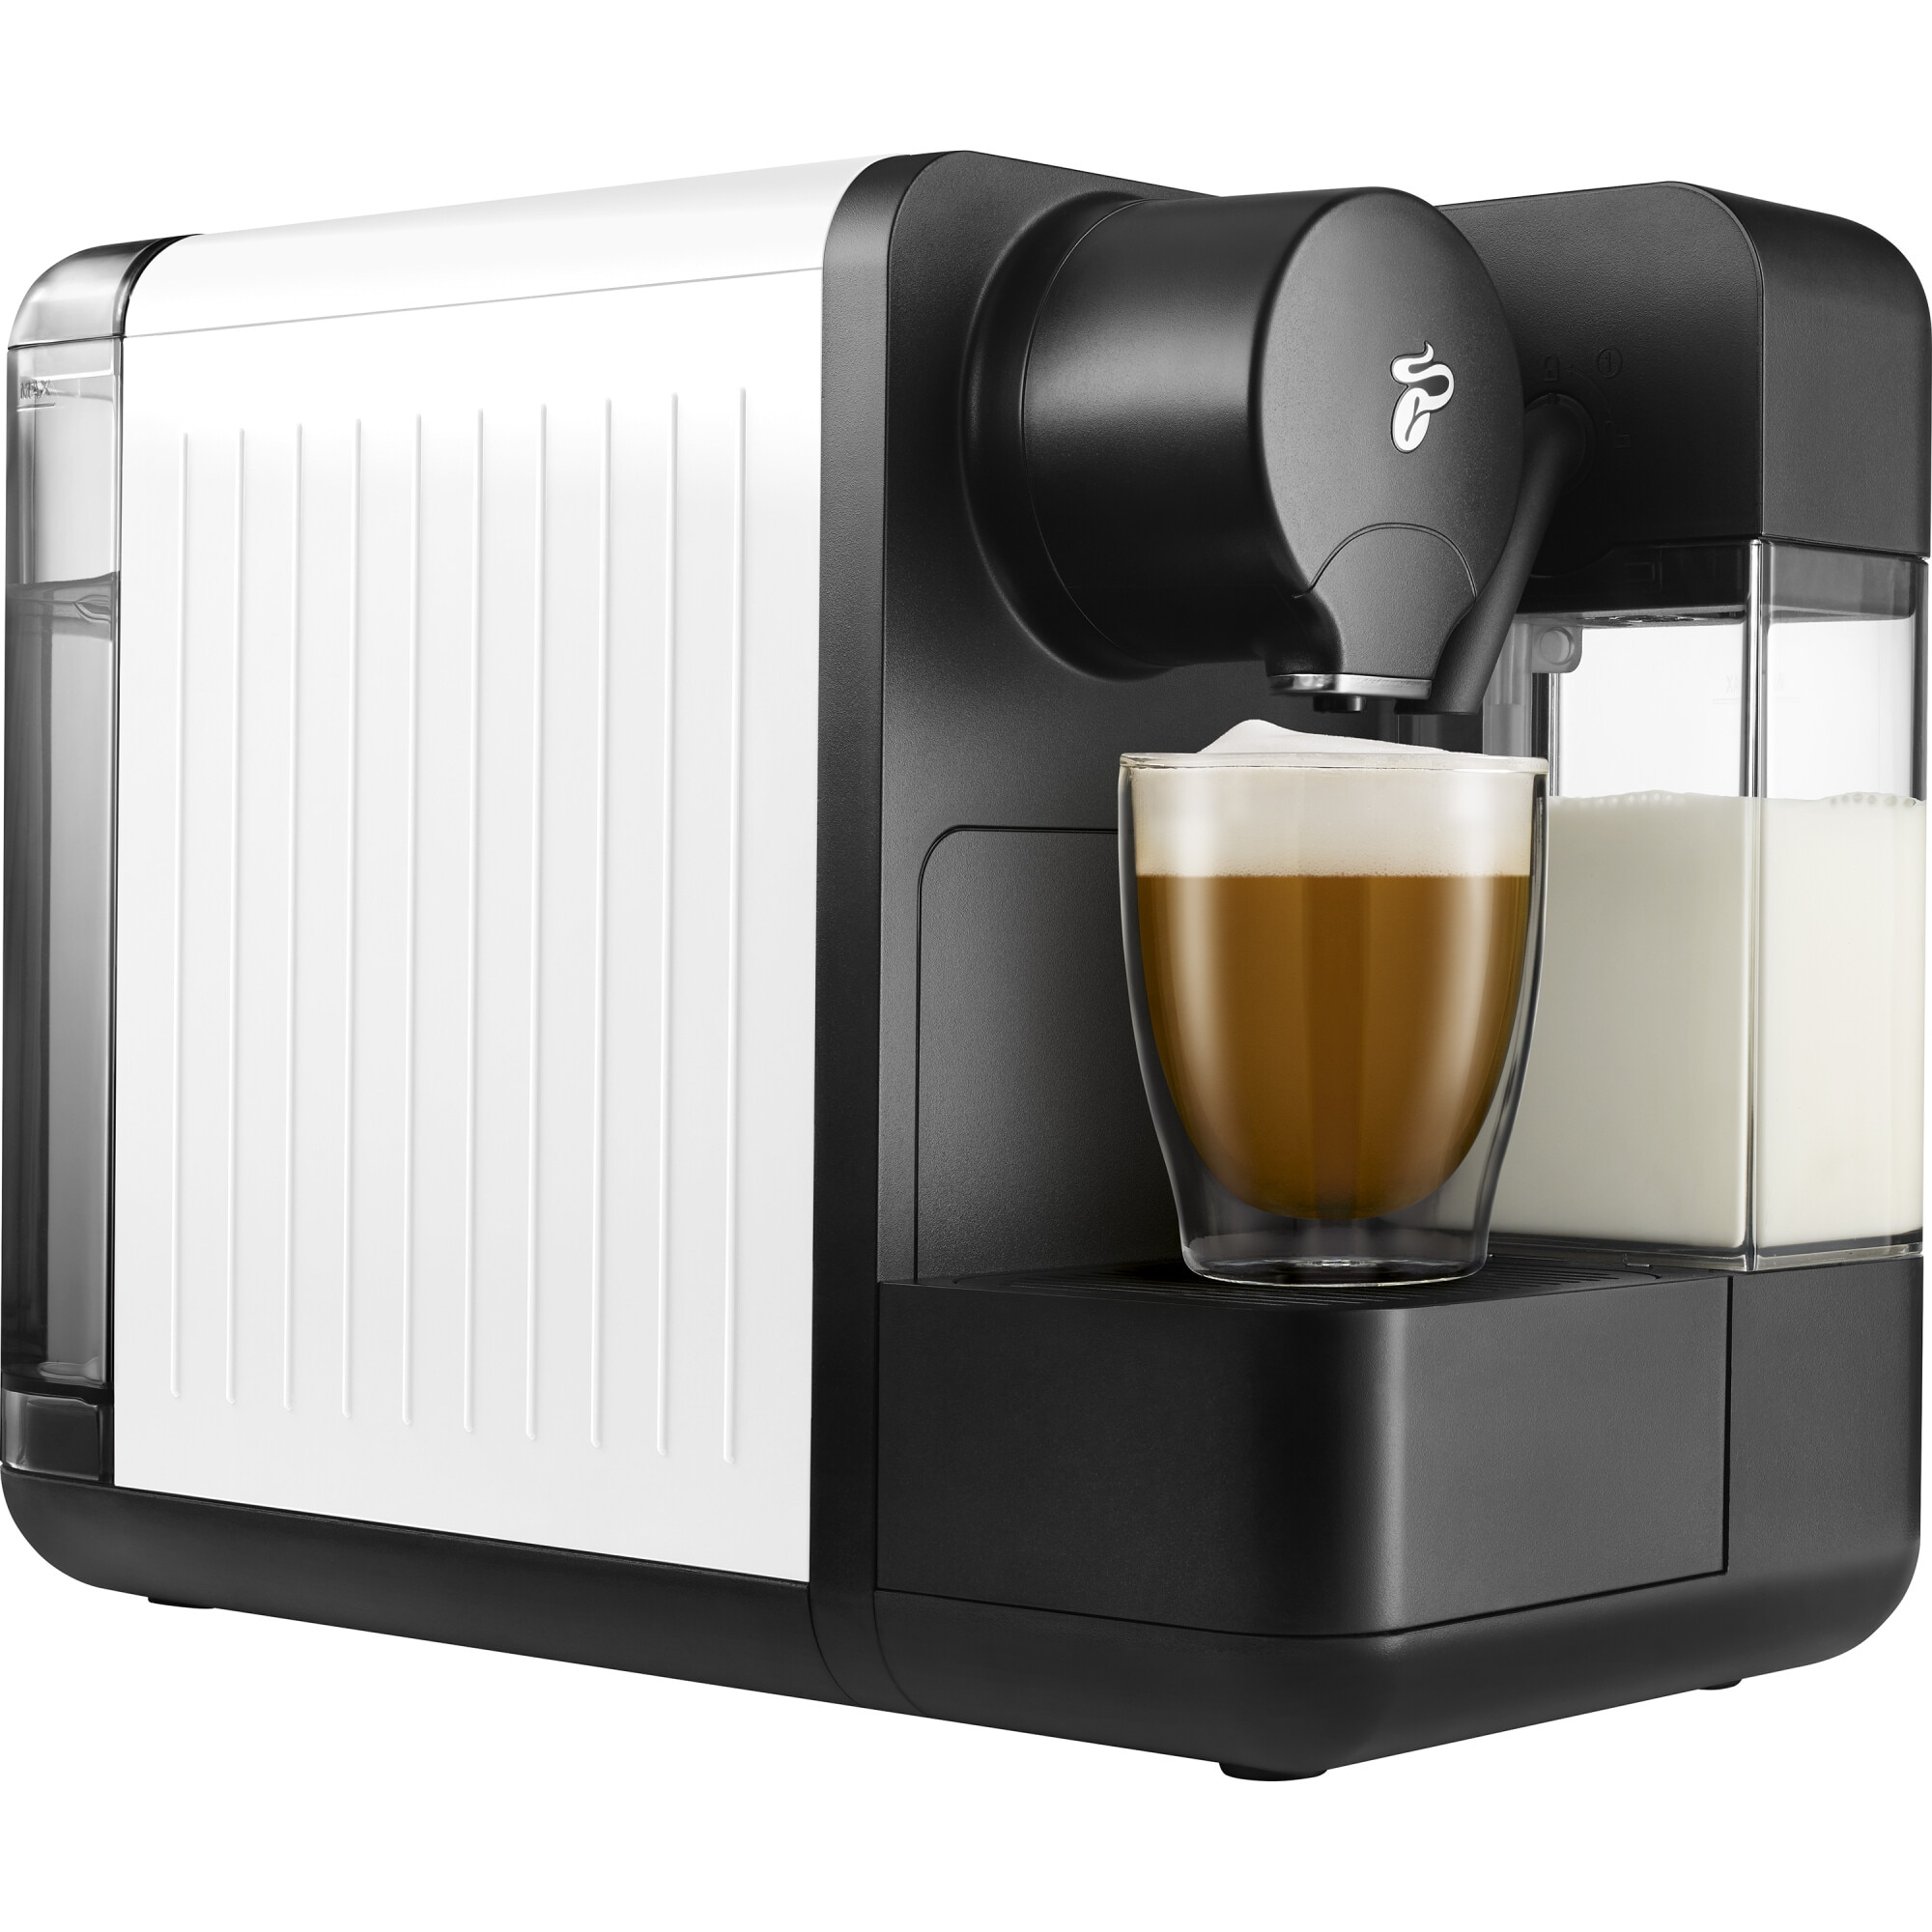 Fotografie Espressor Tchibo Cafissimo milk white, rezervor apa 1.2l, rezervor lapte 400ml, tip bauturi: Espresso Café Crema, Cafea Lunga, Cappuccino, Latte, Alb